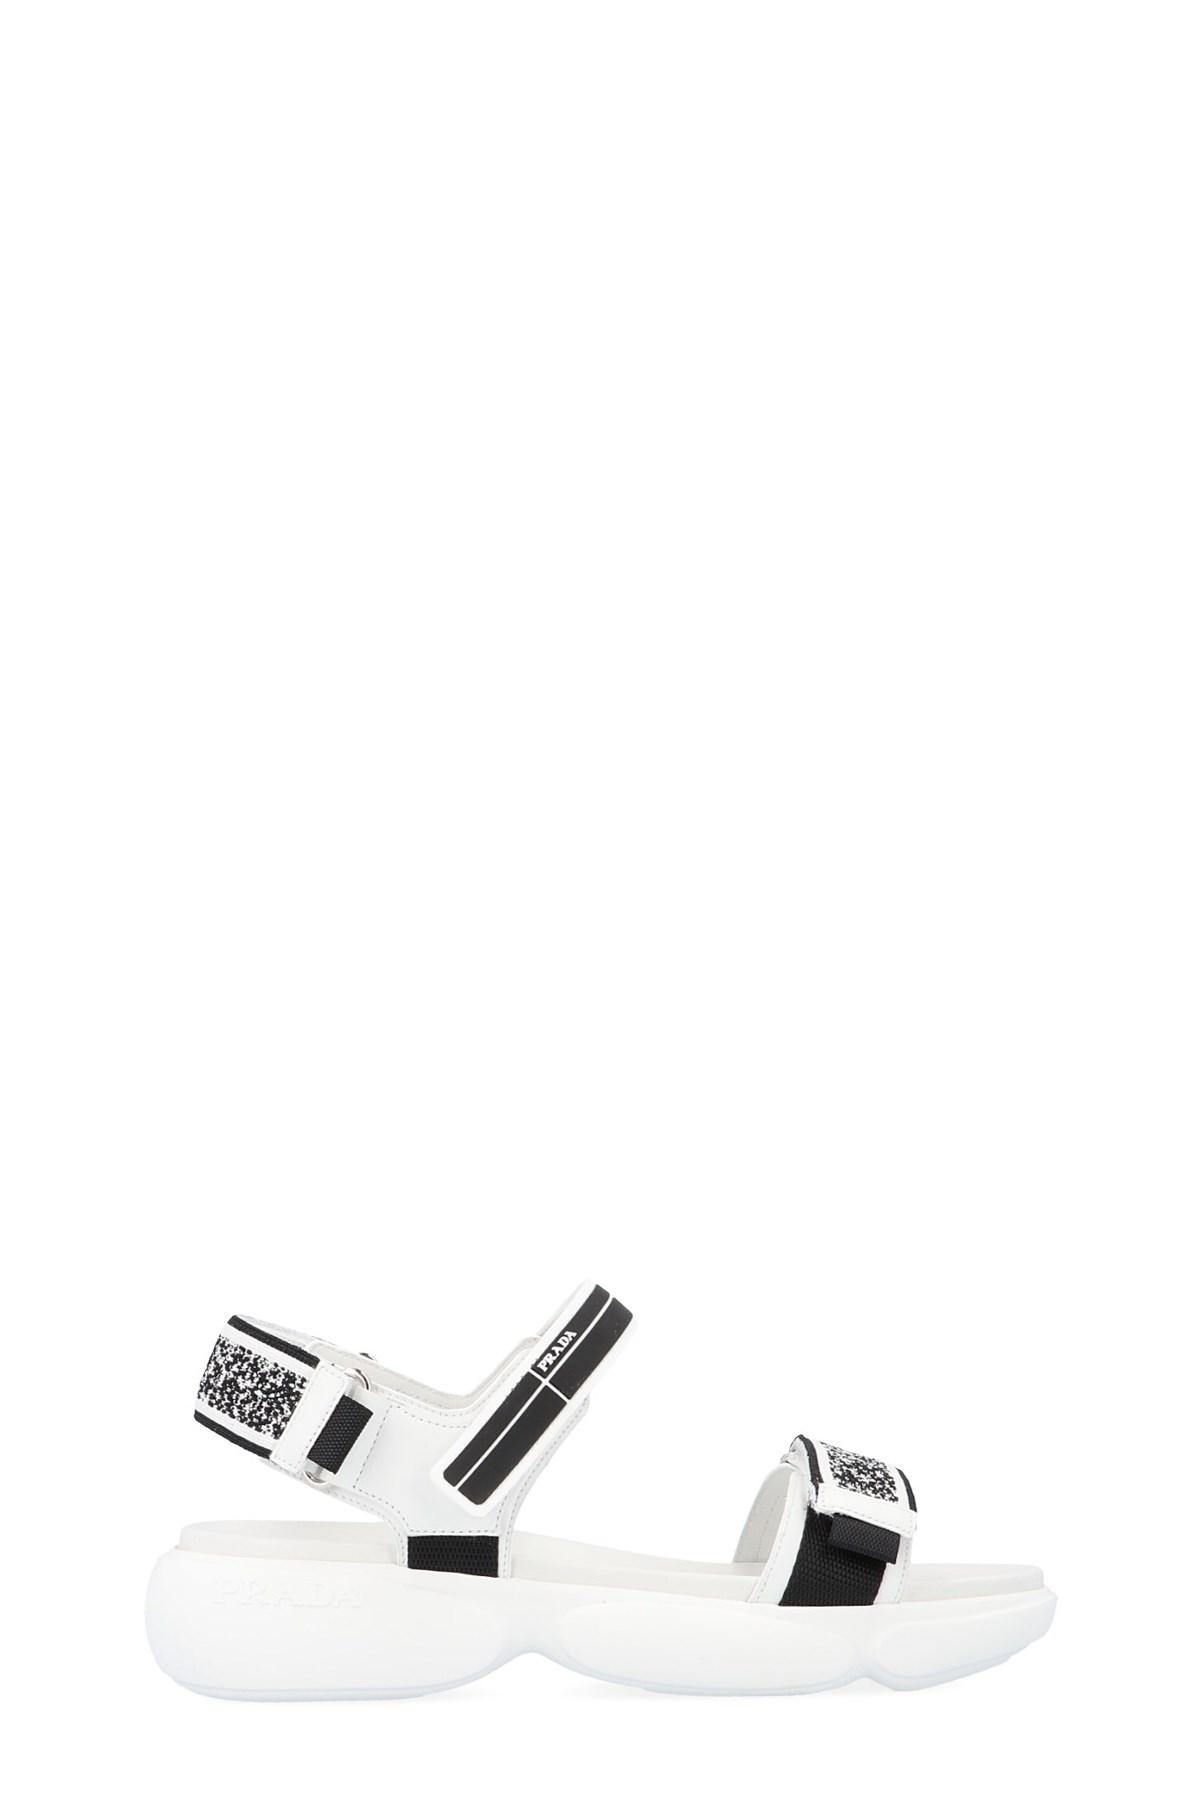 584f55659fceb prada logo sandals available on julian-fashion.com - 67766